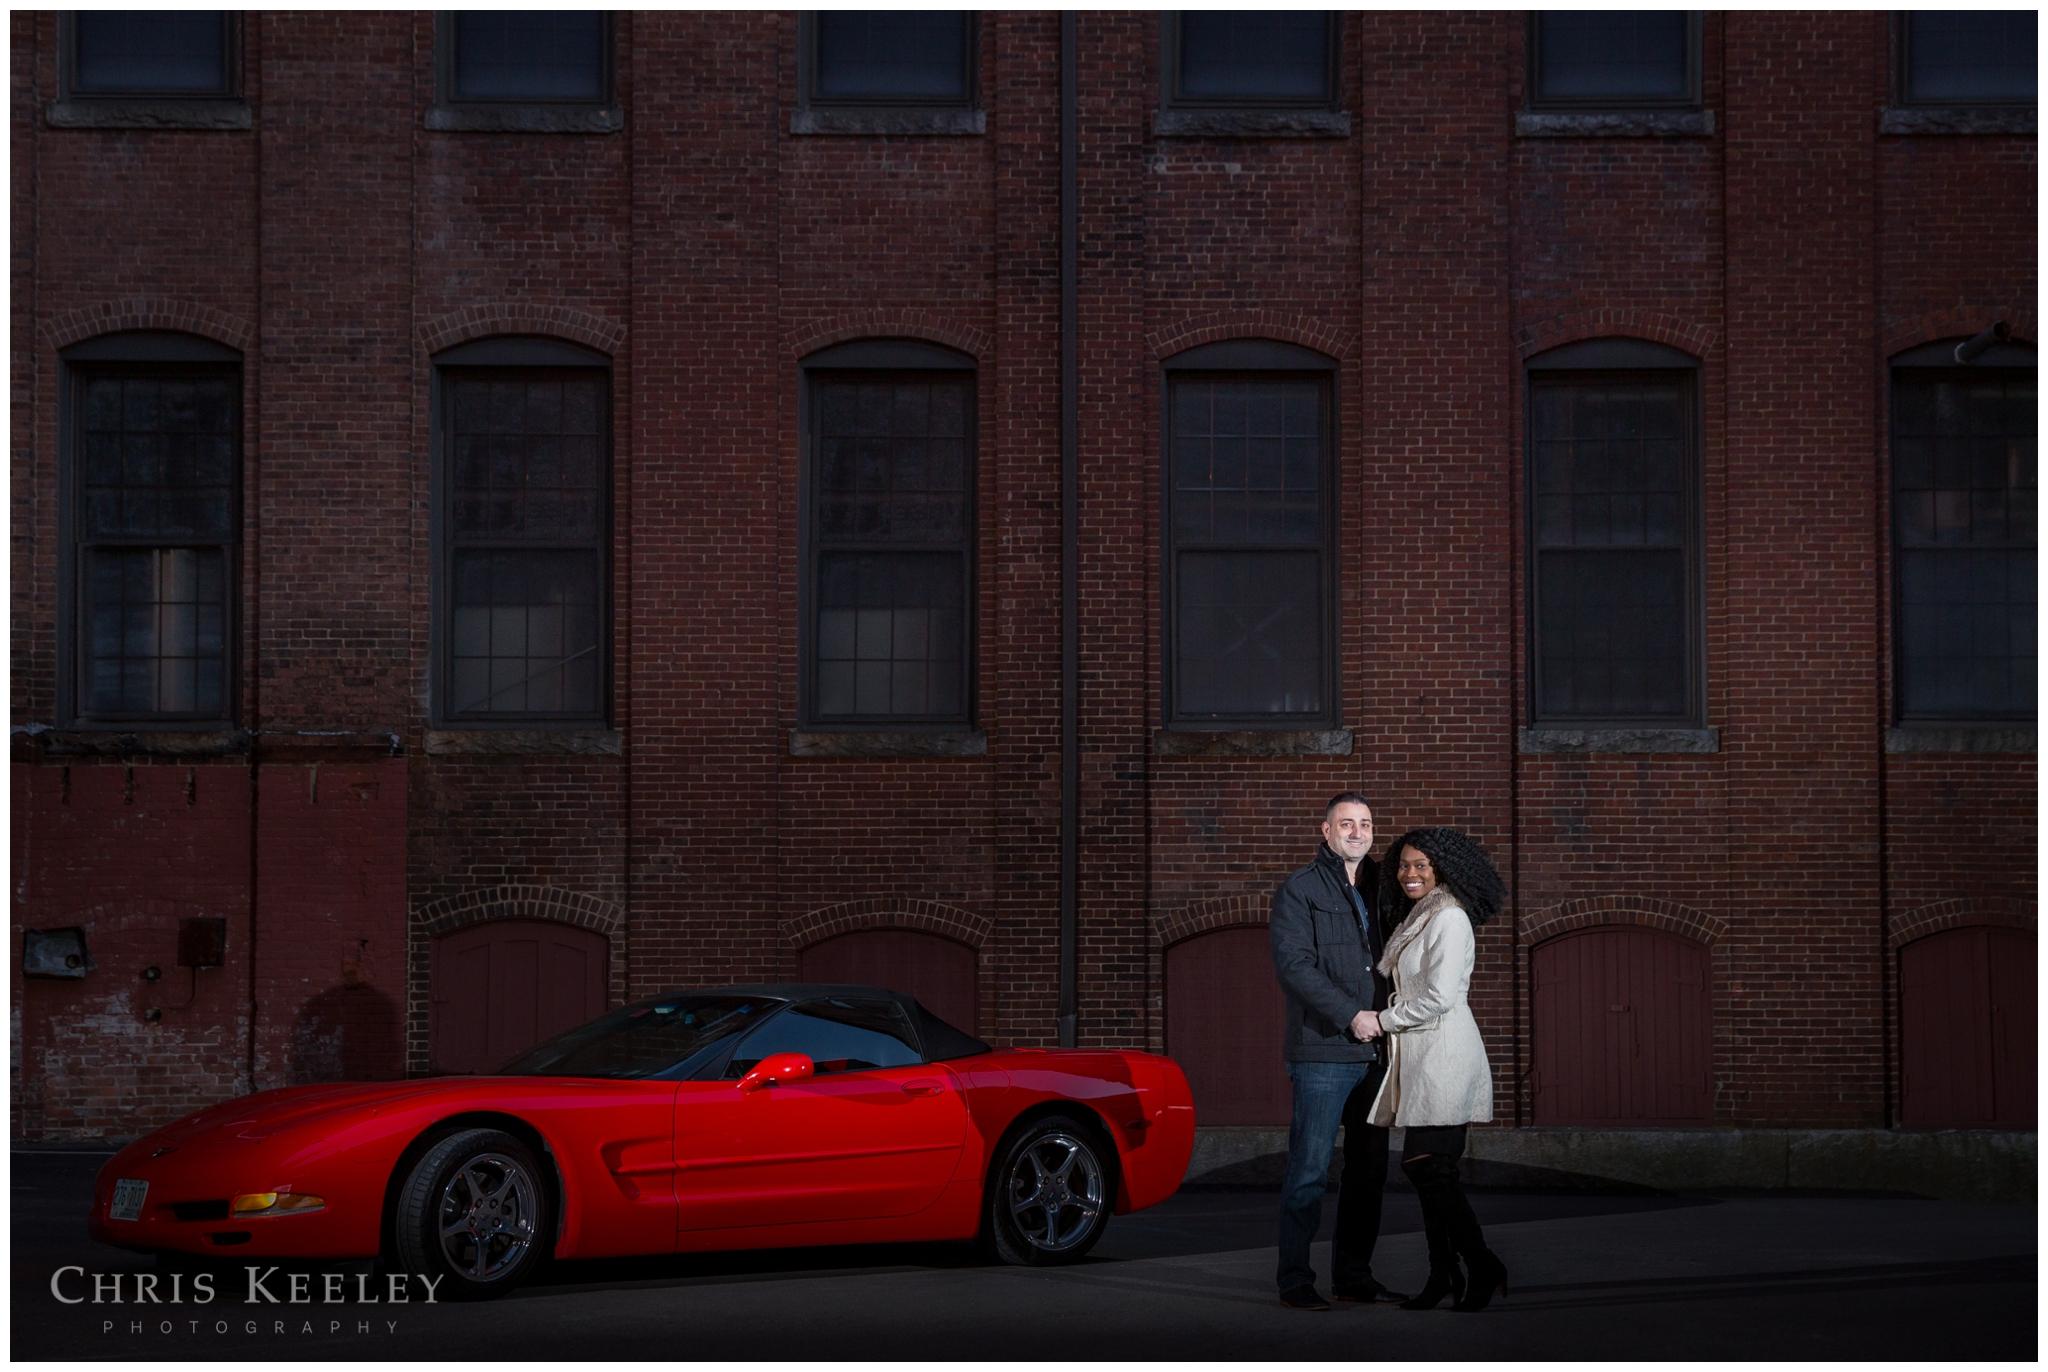 chris-keeley-photography-dover-new-hampshire-engagement-wedding-01.jpg